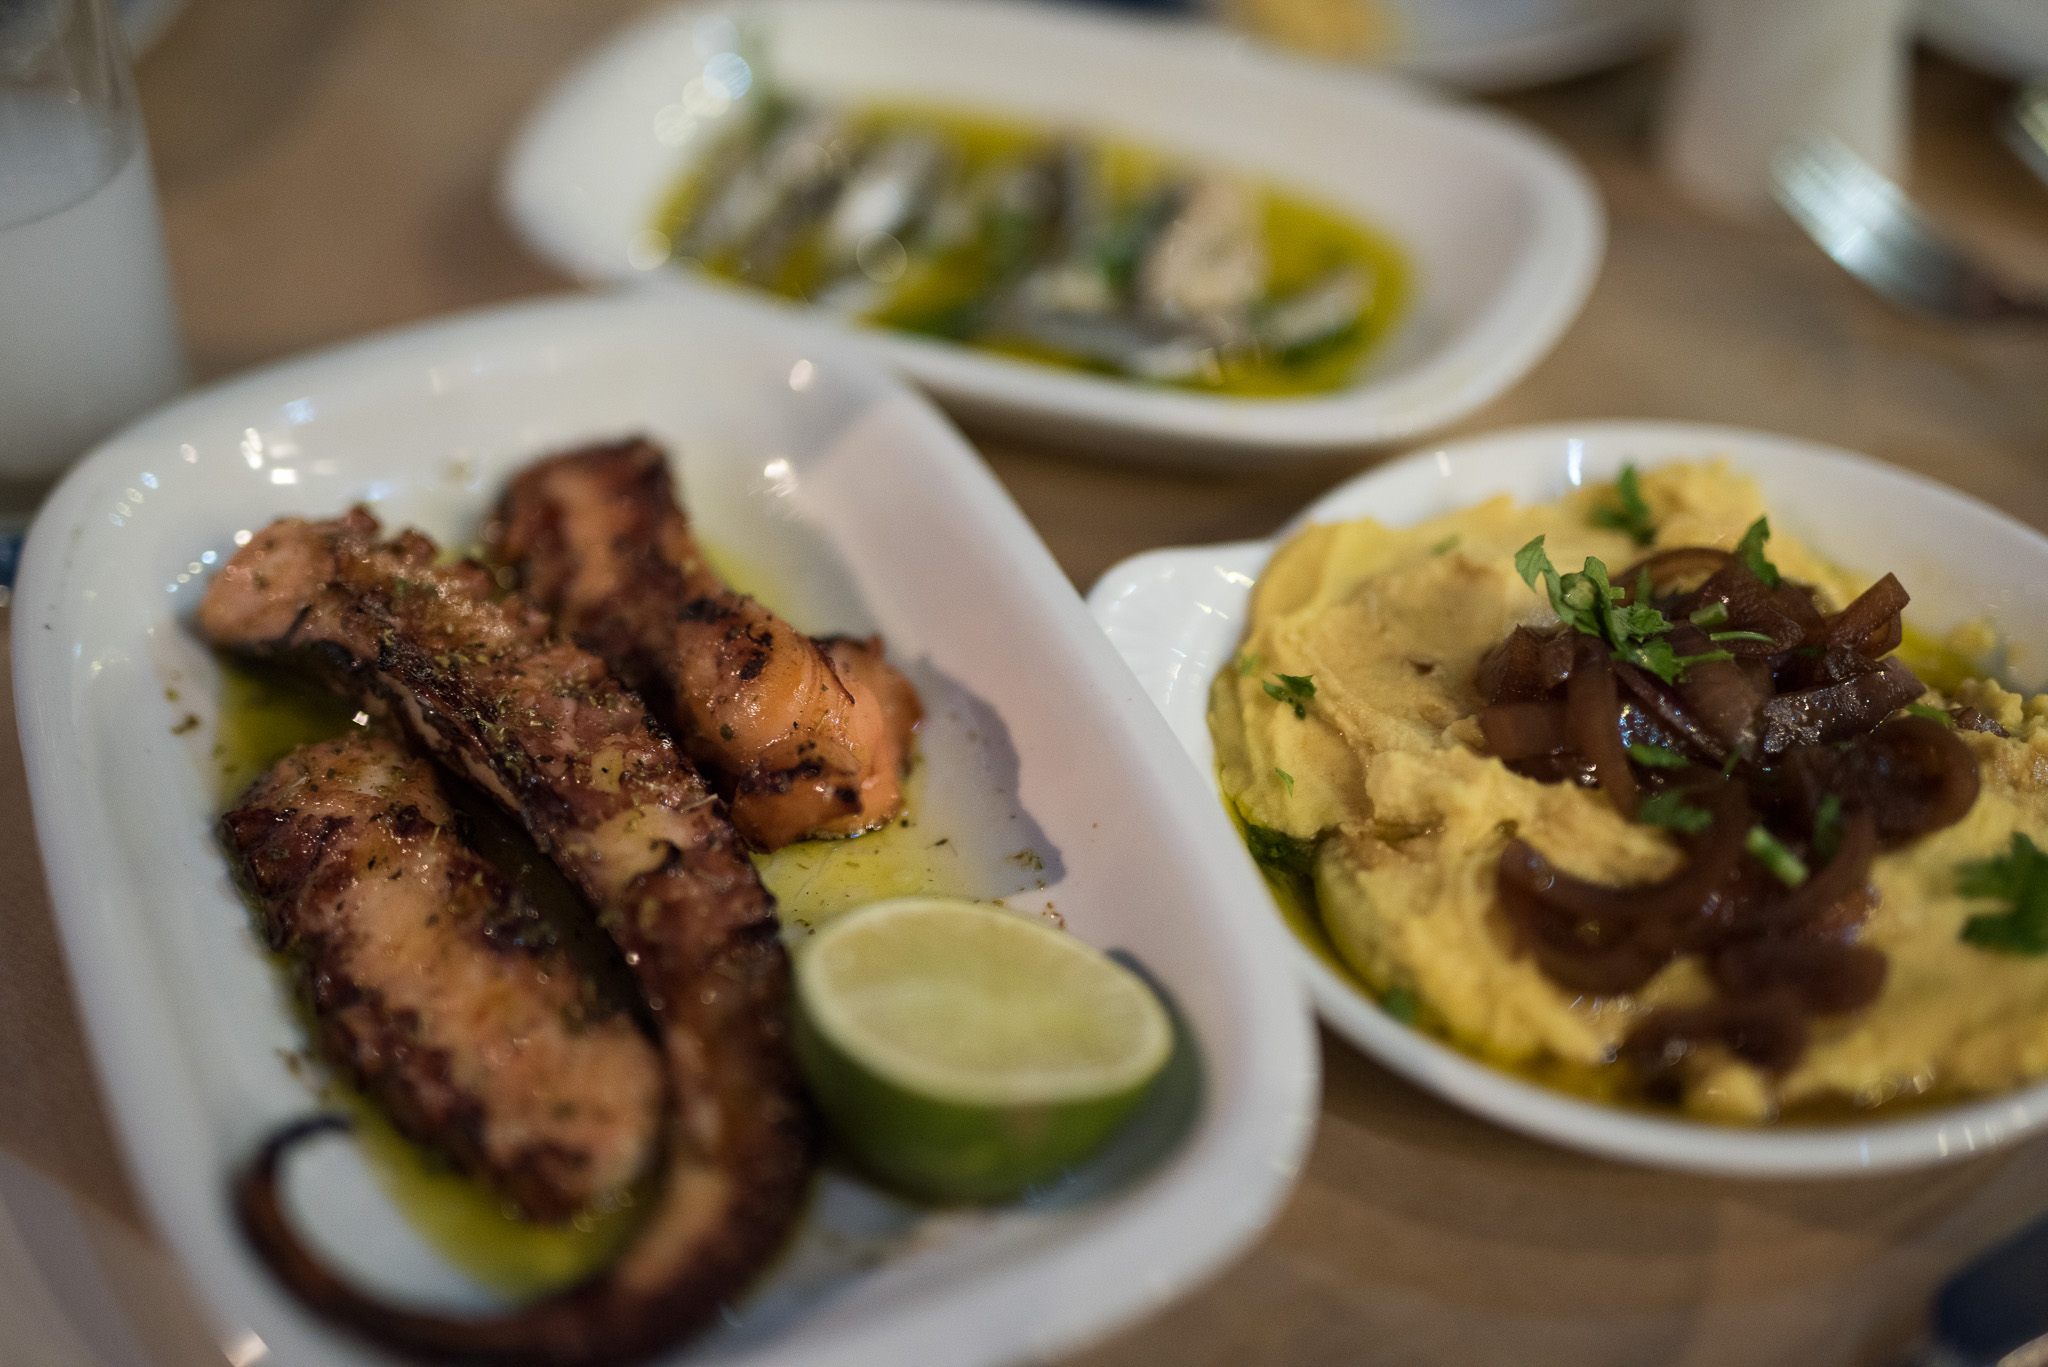 Taverna food in Chania Crete